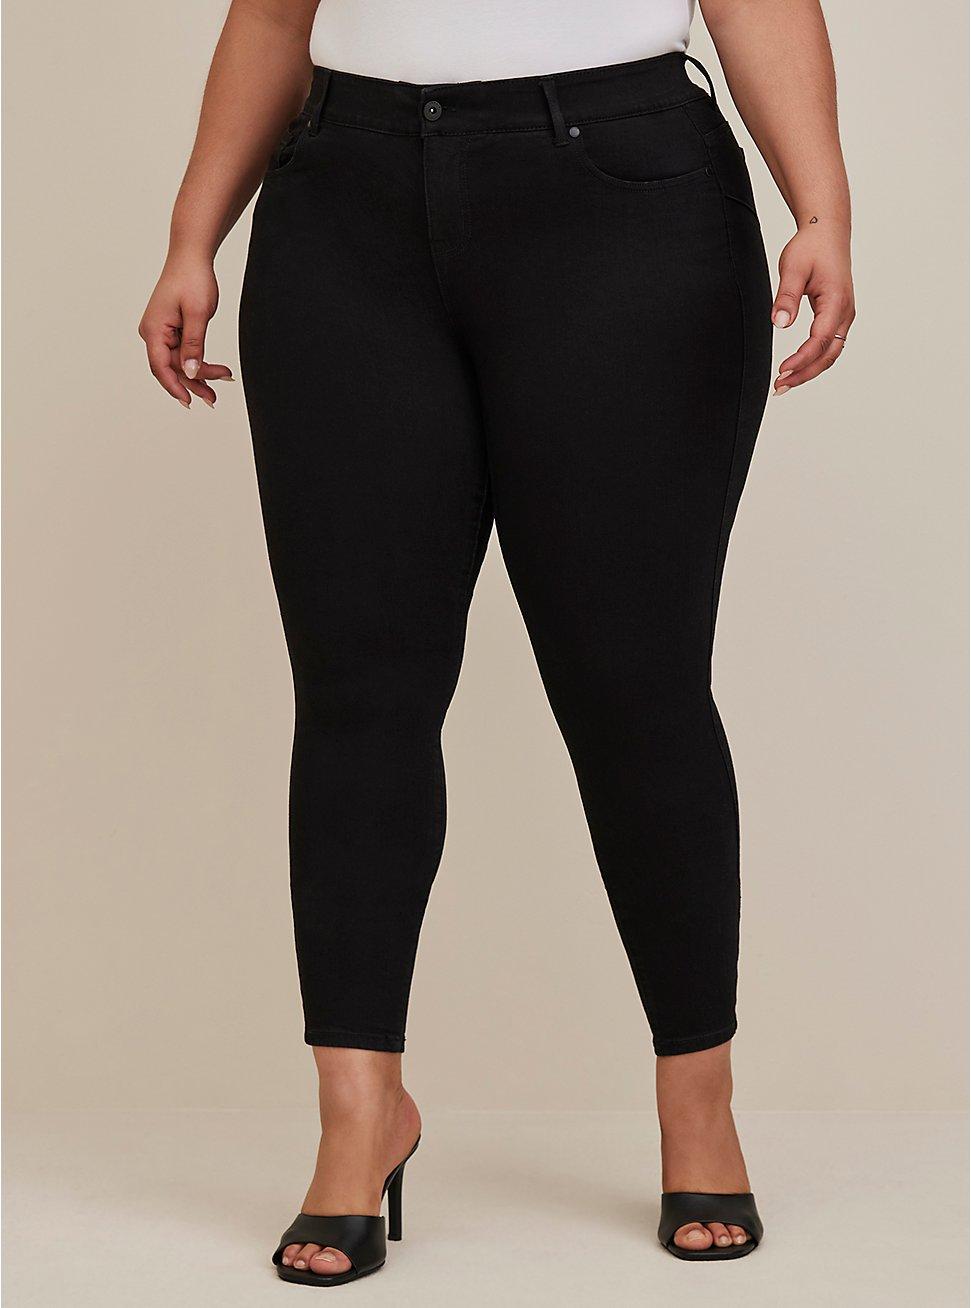 Sky High Skinny Jean - Premium Stretch Black, DEEP BLACK, hi-res